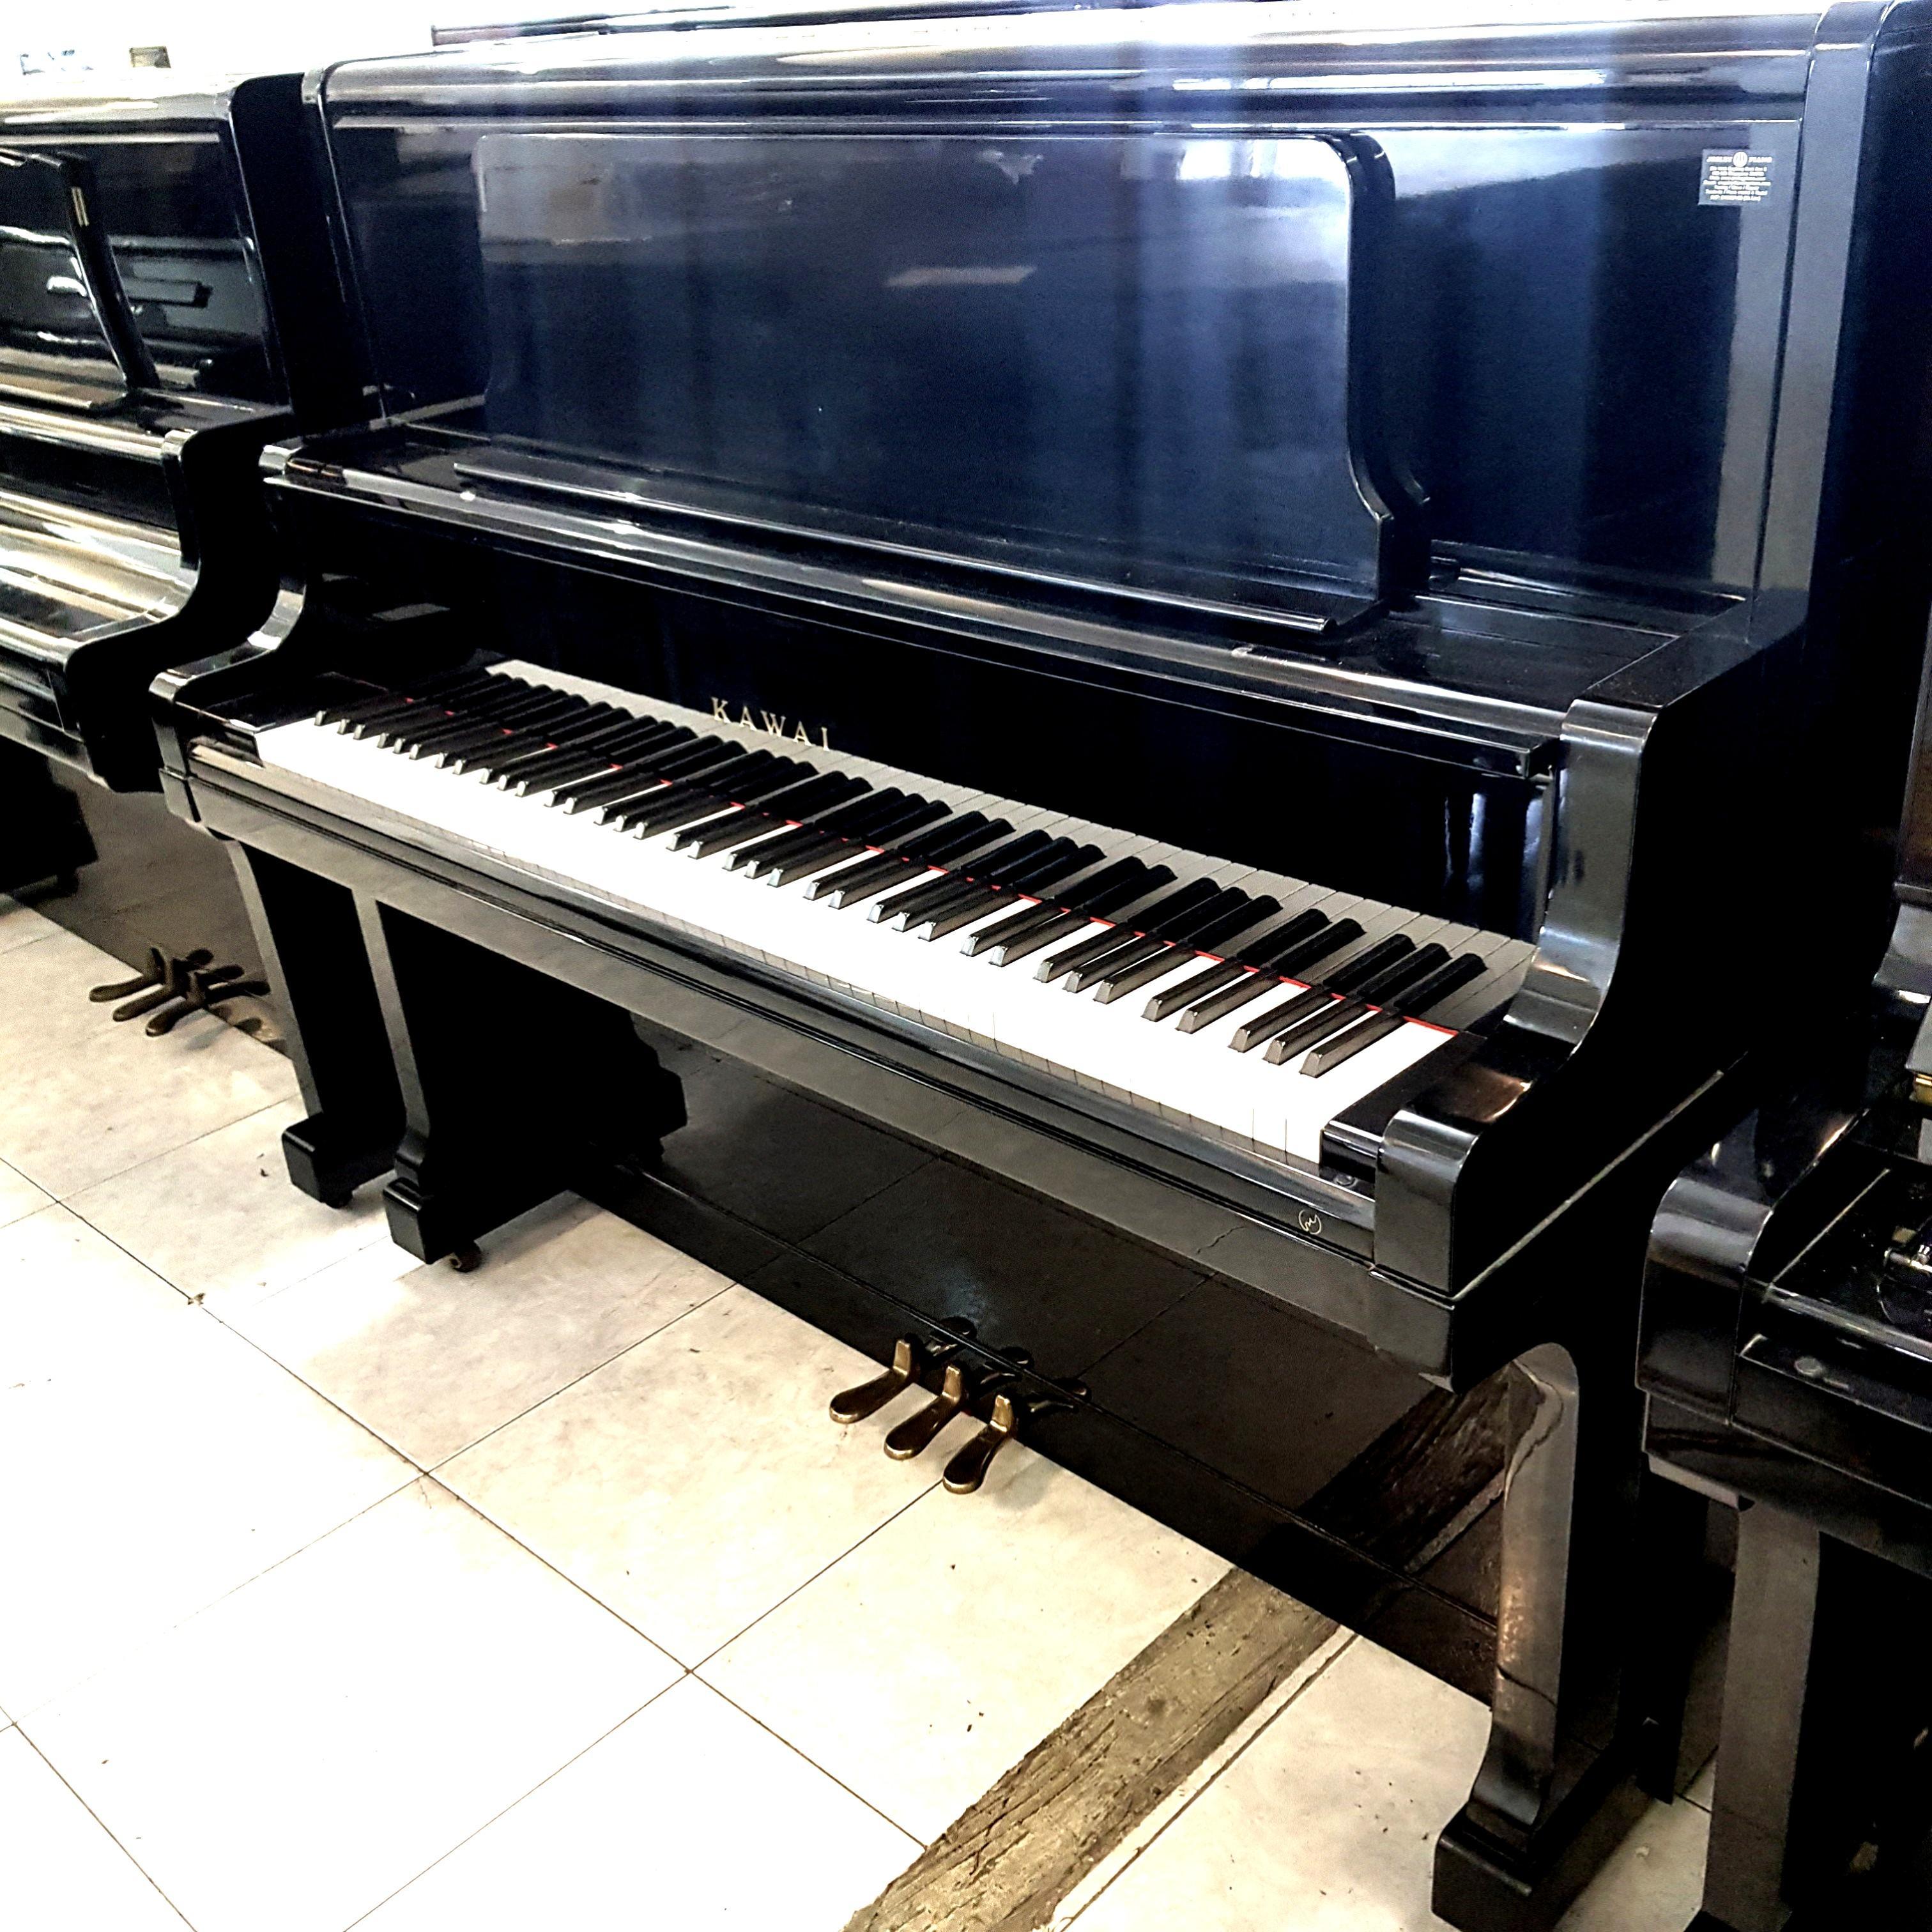 KAWAI Piano US-60, Music & Media, Music Instruments on Carousell